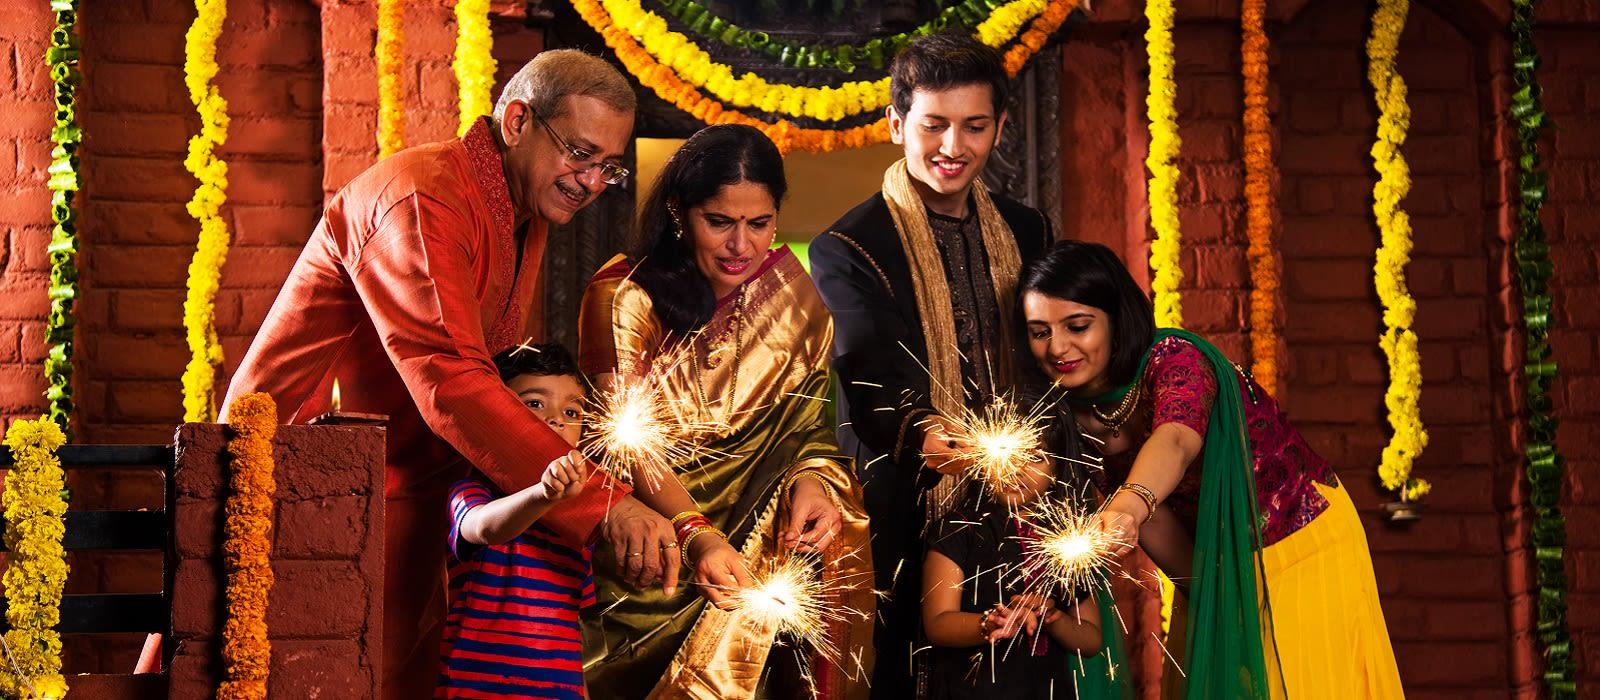 Festival Fever: Diwali in India Tour Trip 4